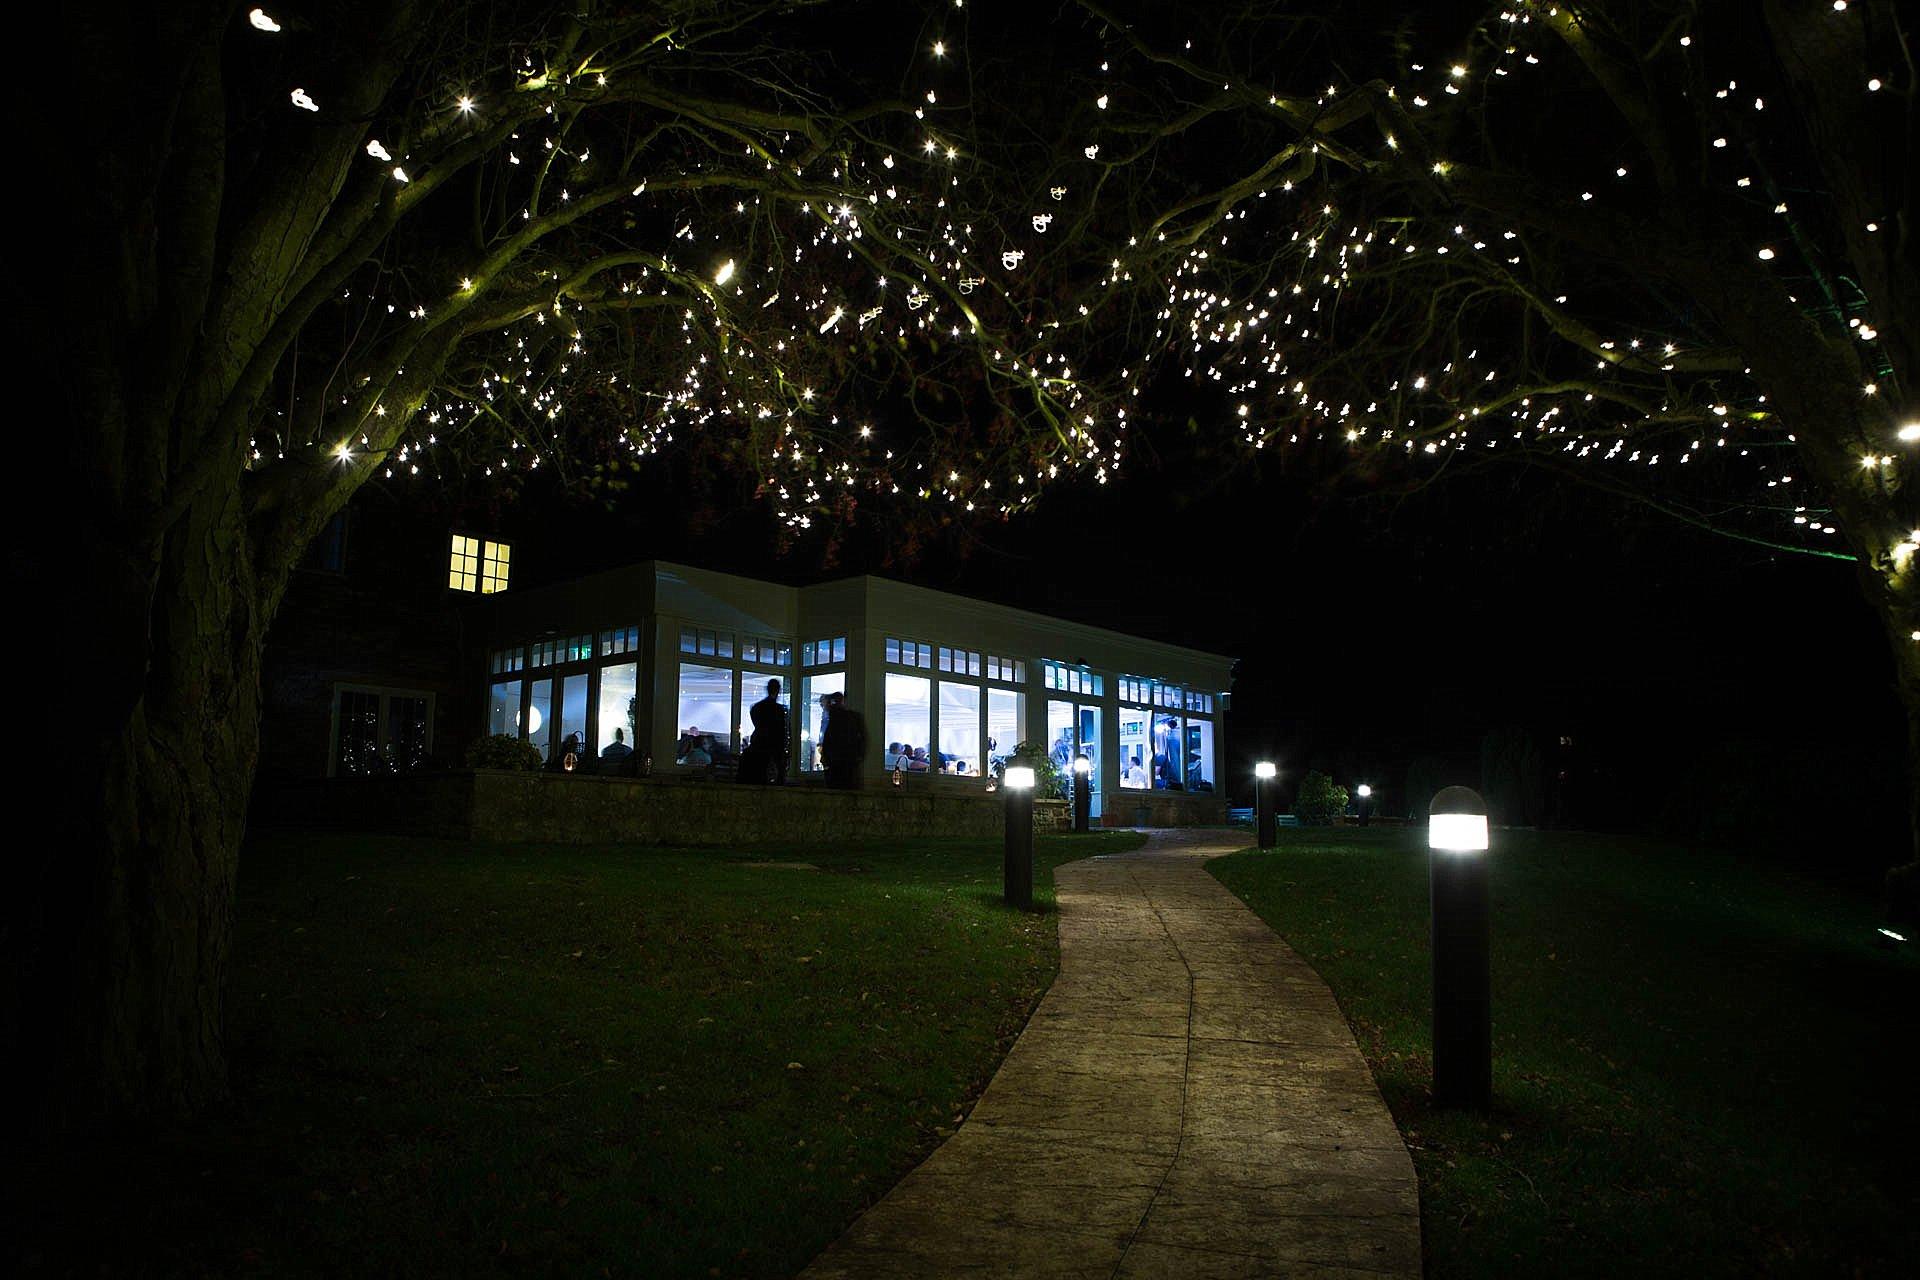 Charingworth after dark